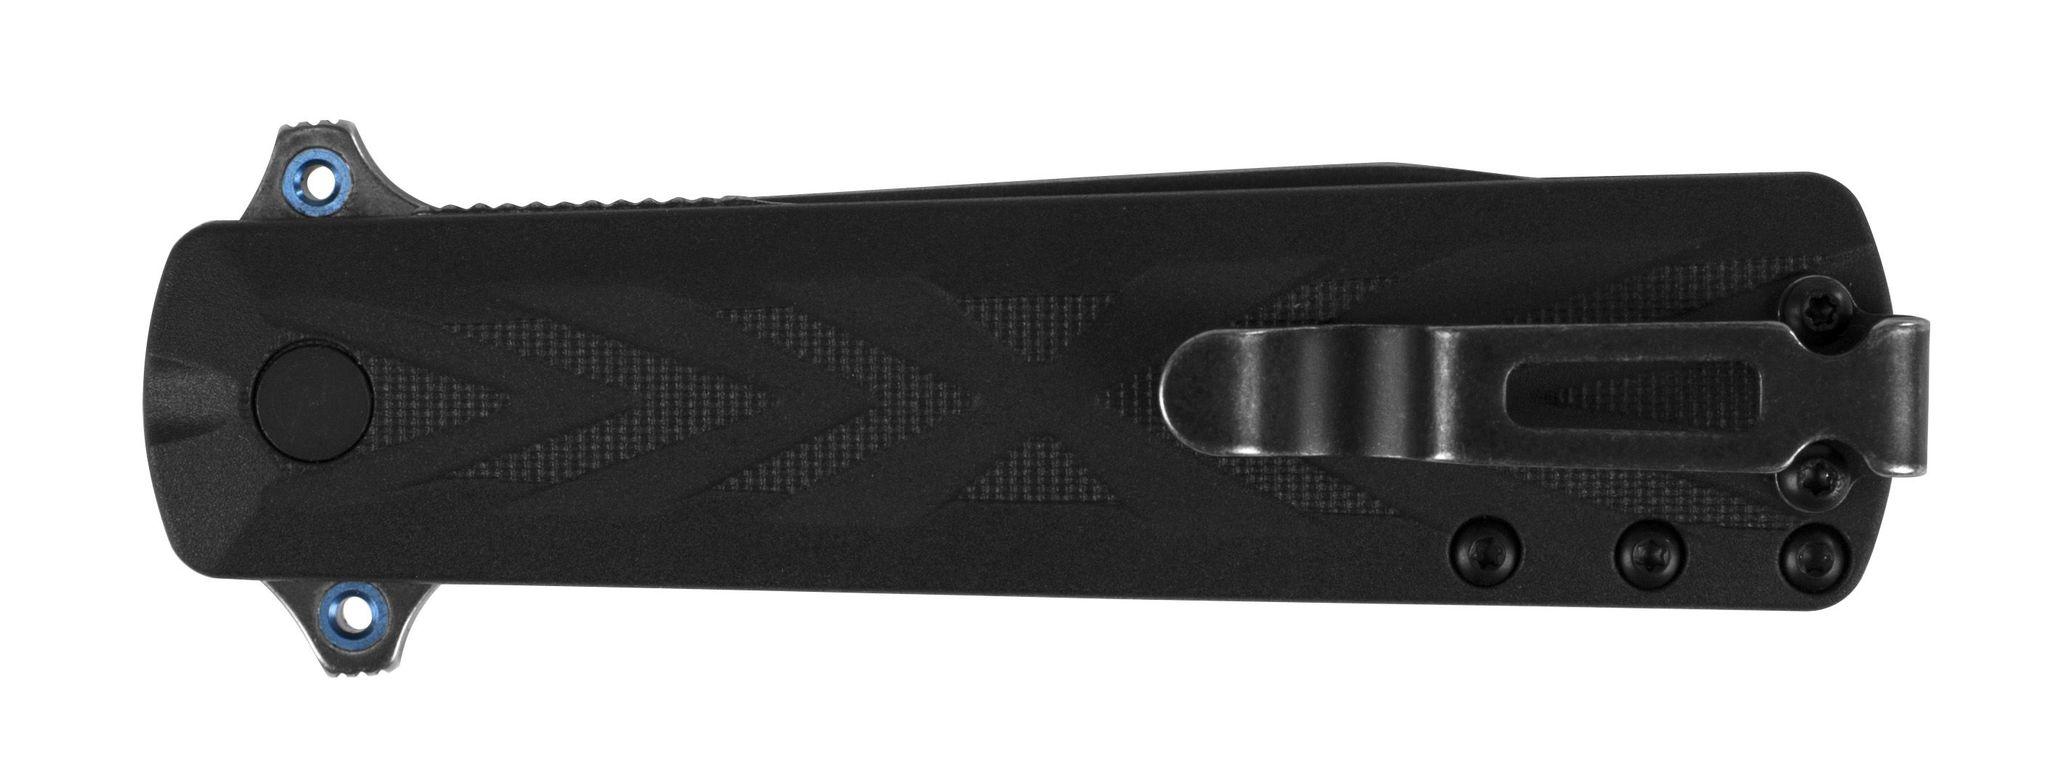 Фото 4 - Складной полуавтоматический нож Kershaw Barstow K3960, сталь 8Cr13MoV, рукоять пластик